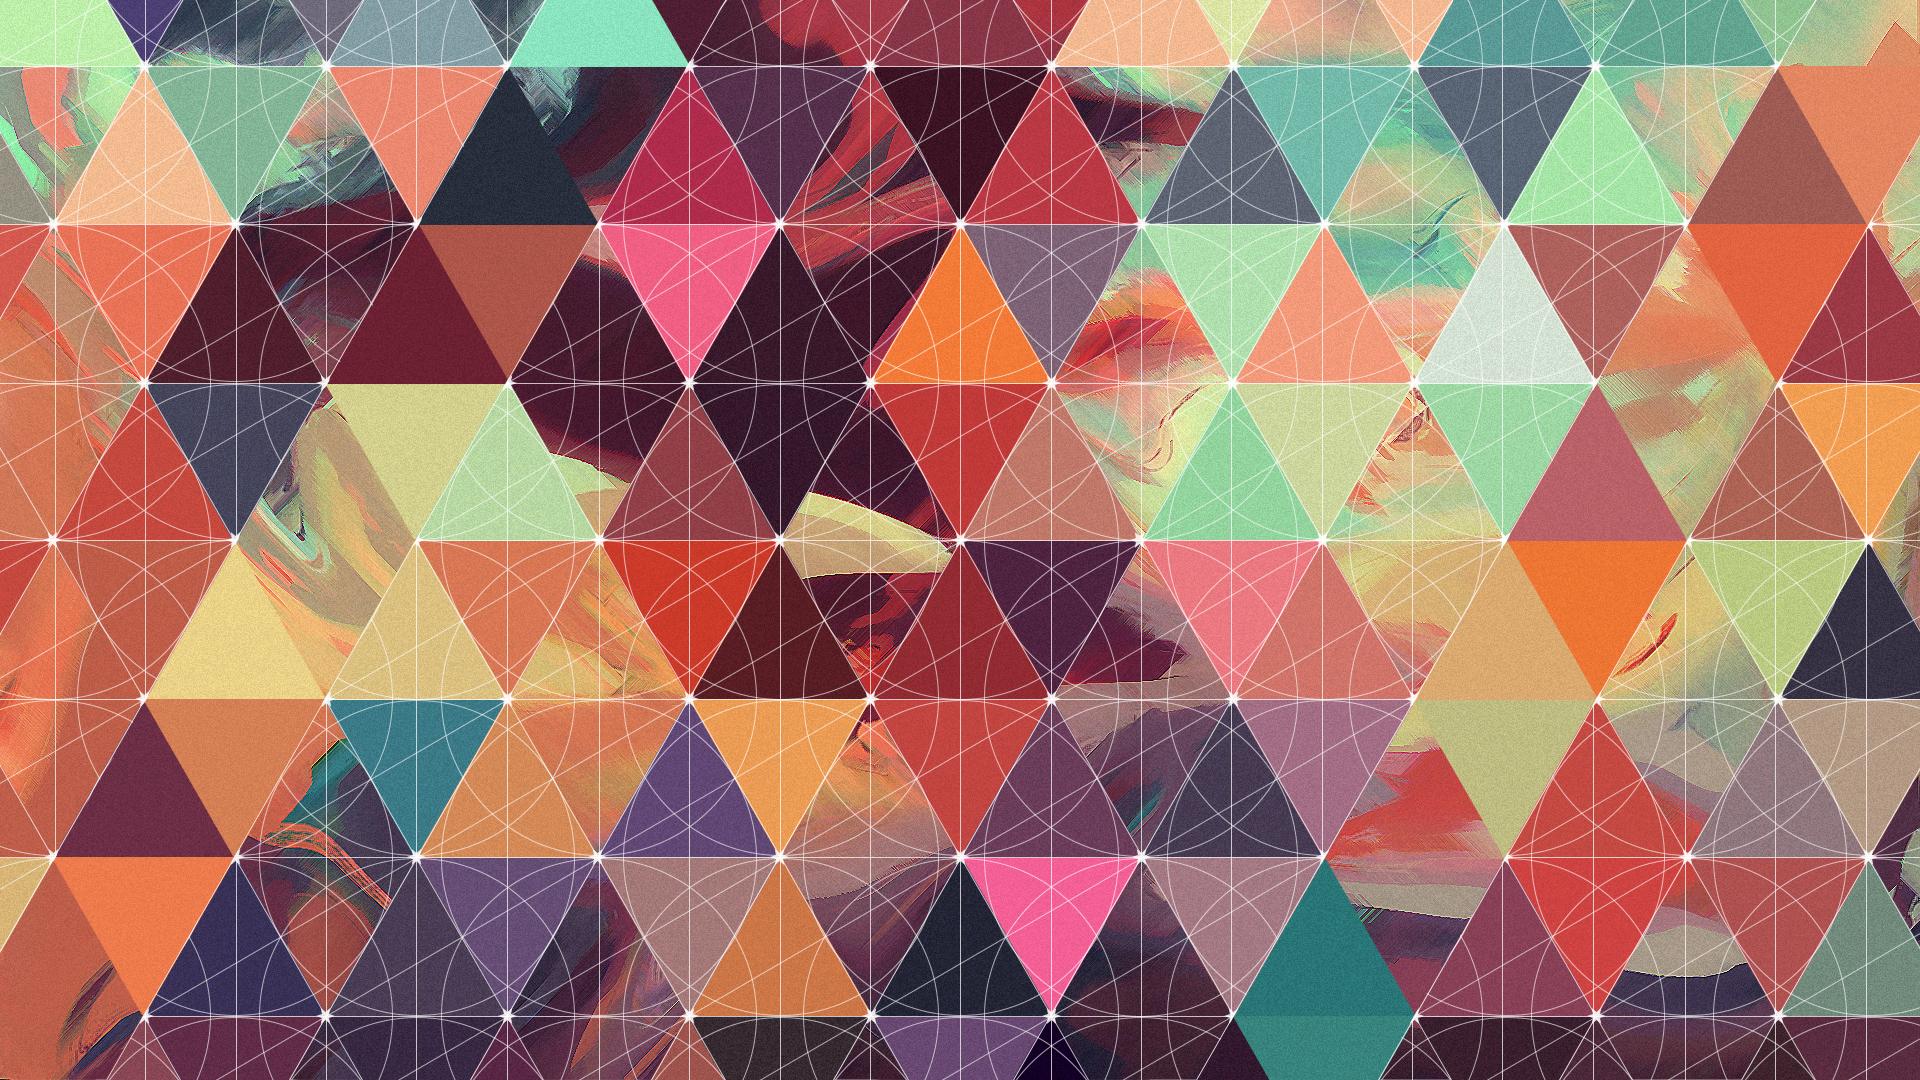 Abstract Geometric Pattern Cloth Design Wallpaper Stock ...